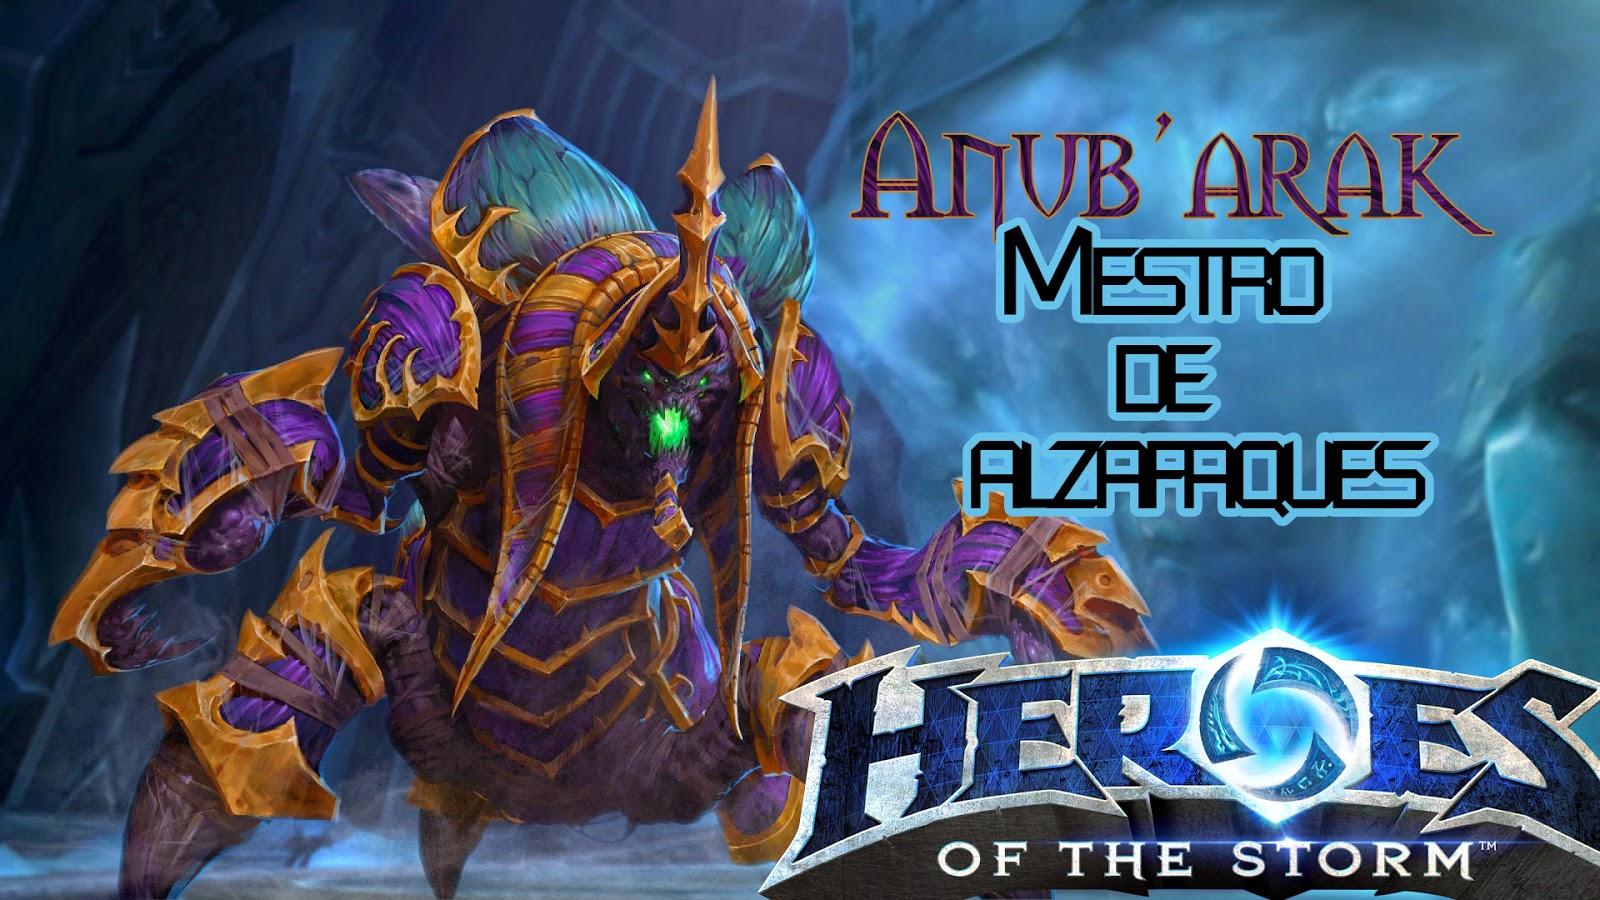 Heroes Of The Storm Sp Build Y Guias Guia Anubarak